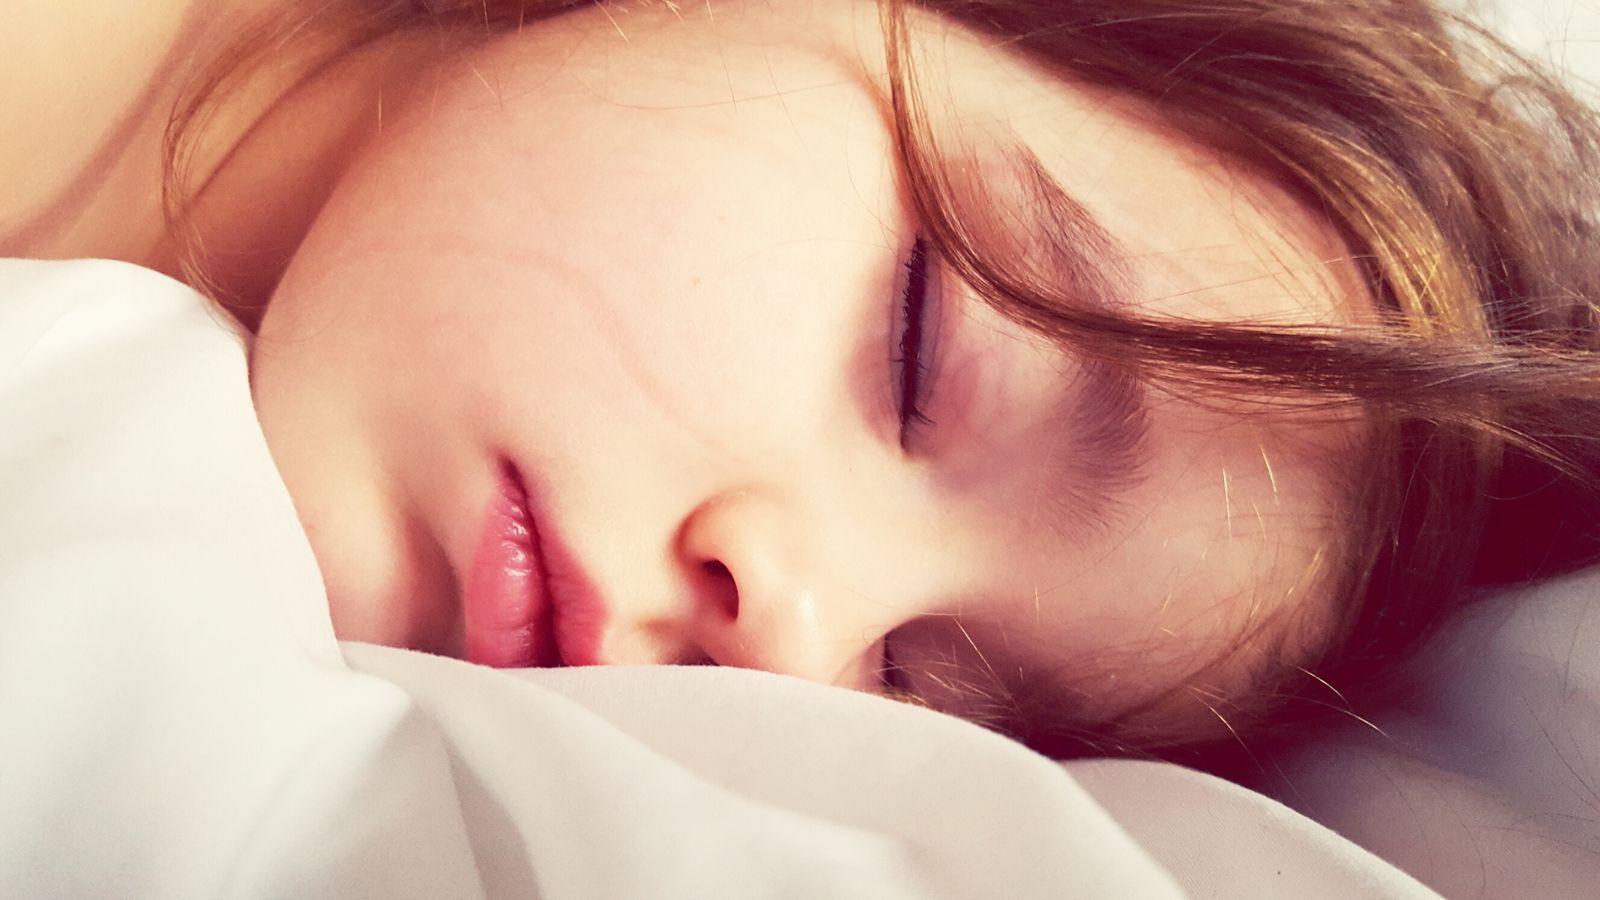 Baby Sleeping Sleeping Girl Phonecamera Smartphone Childhood Child Sleeping Baby  Relaxation Pure Beauty Calm Moment Children Photography Moment Of Silence Innocence